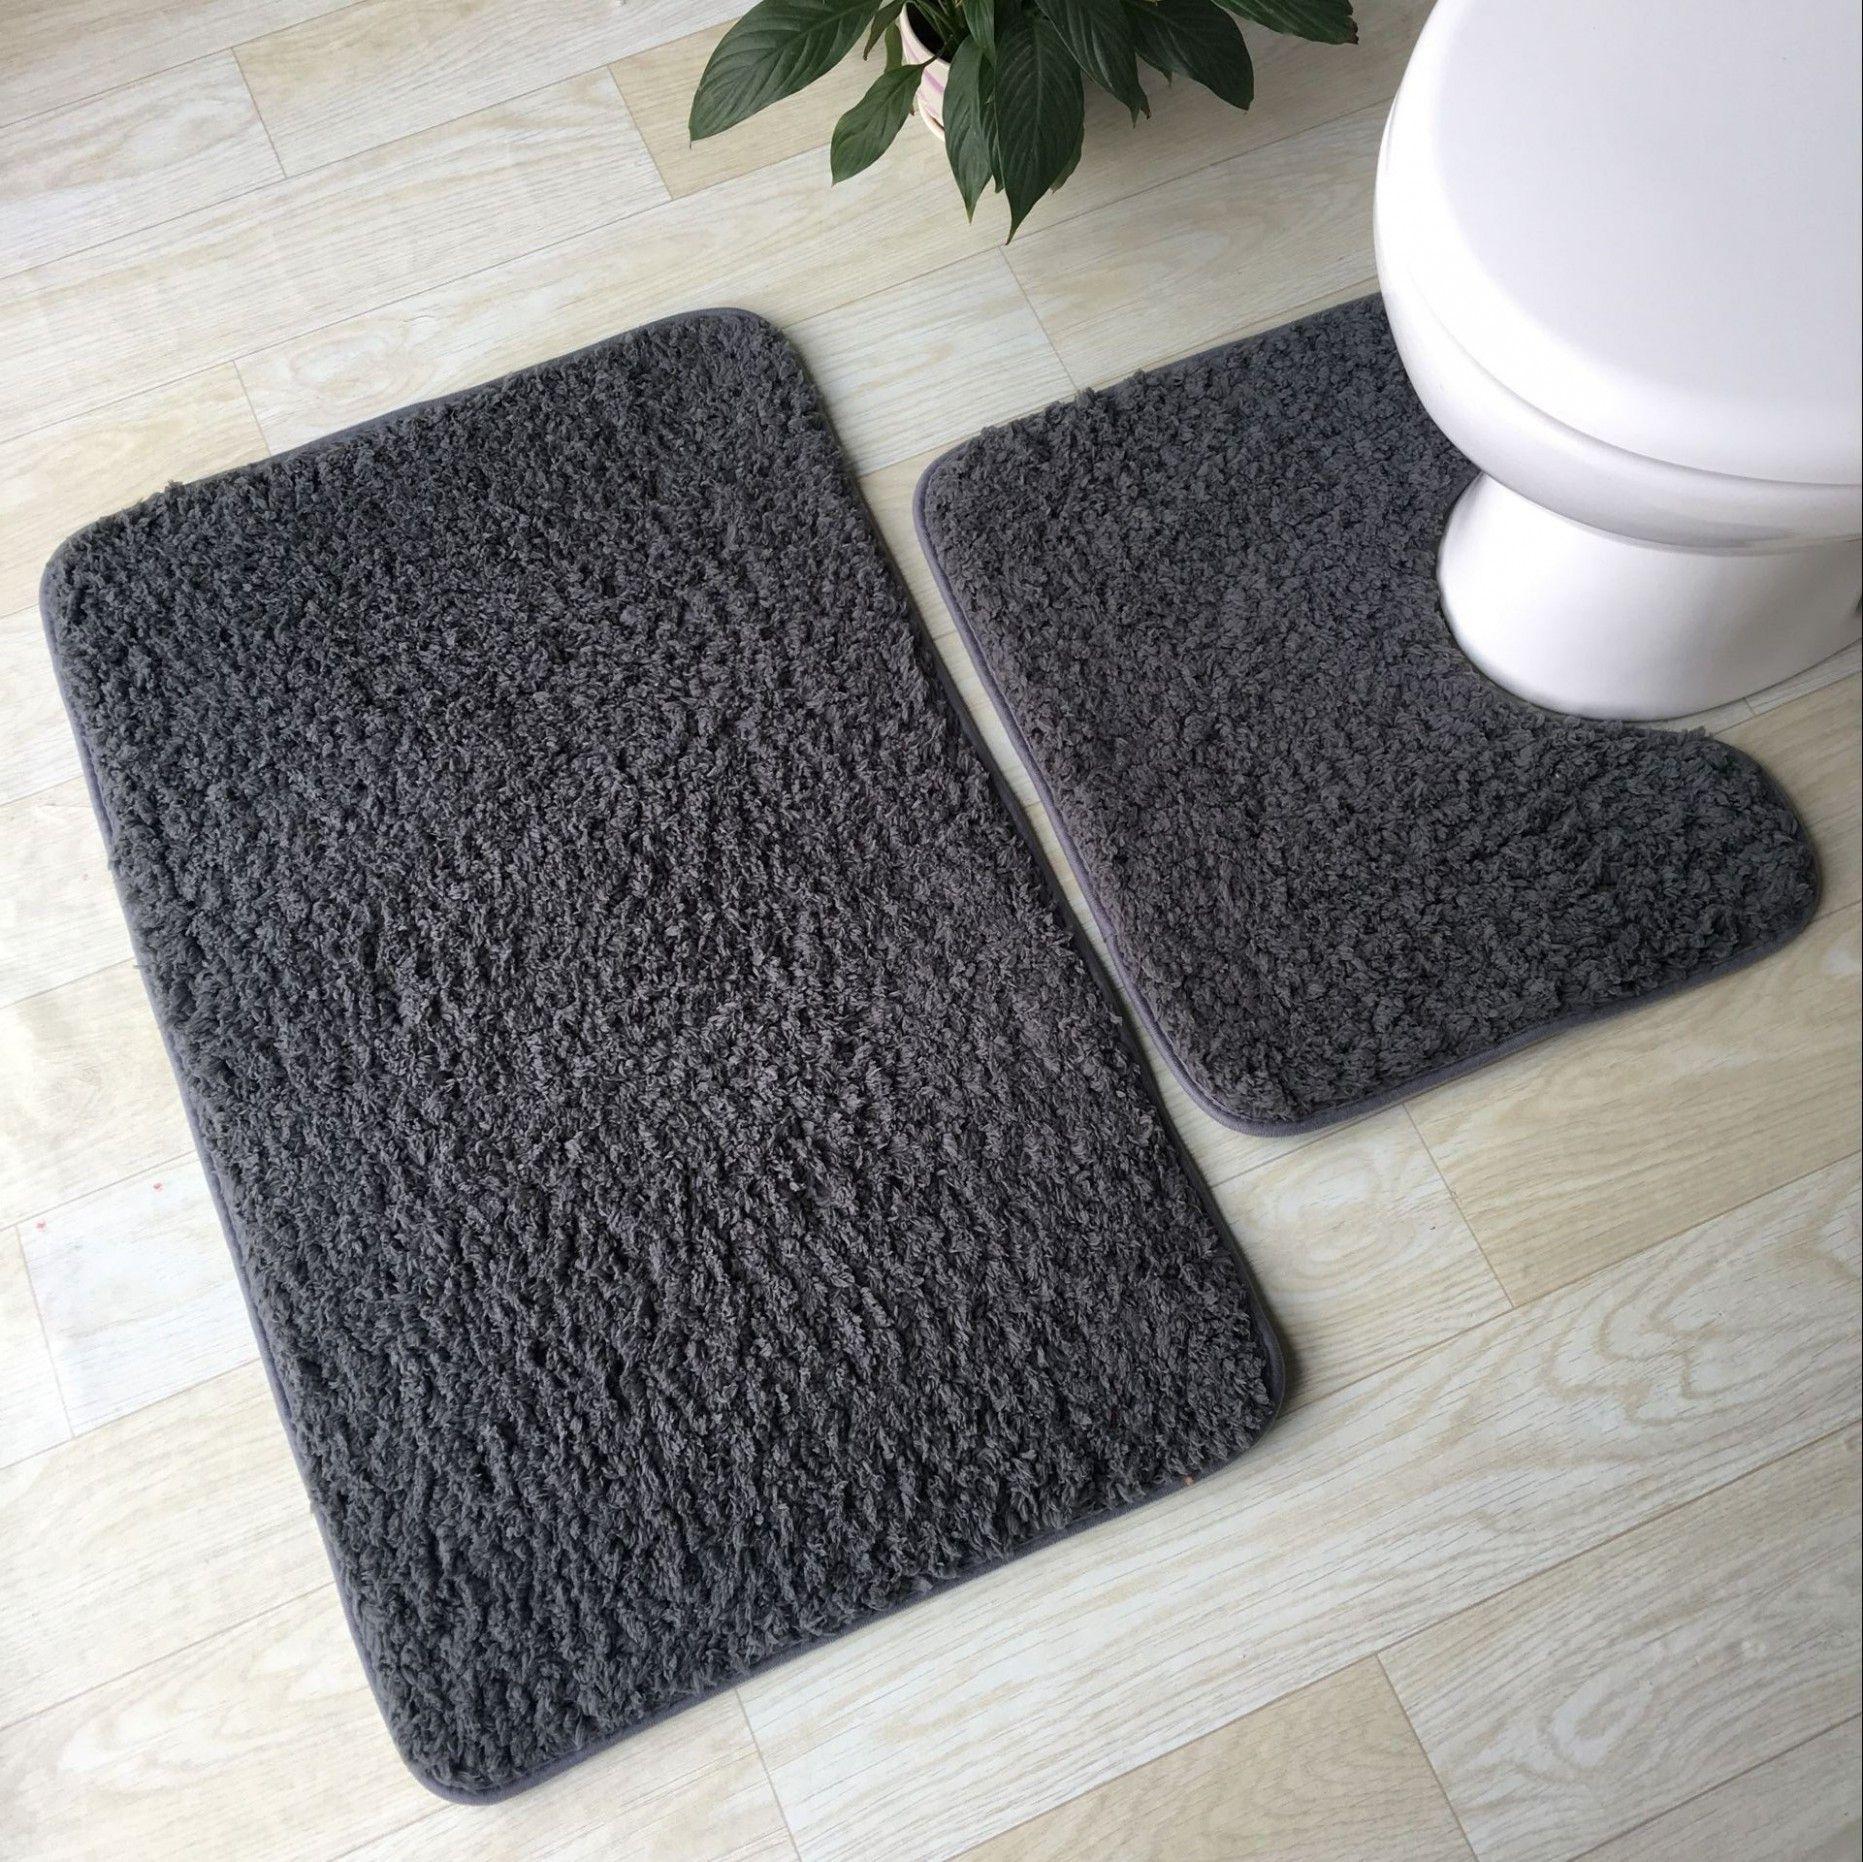 Pin auf Trend Bathroom Rugs 7 & Bathroom Rugs Ideas